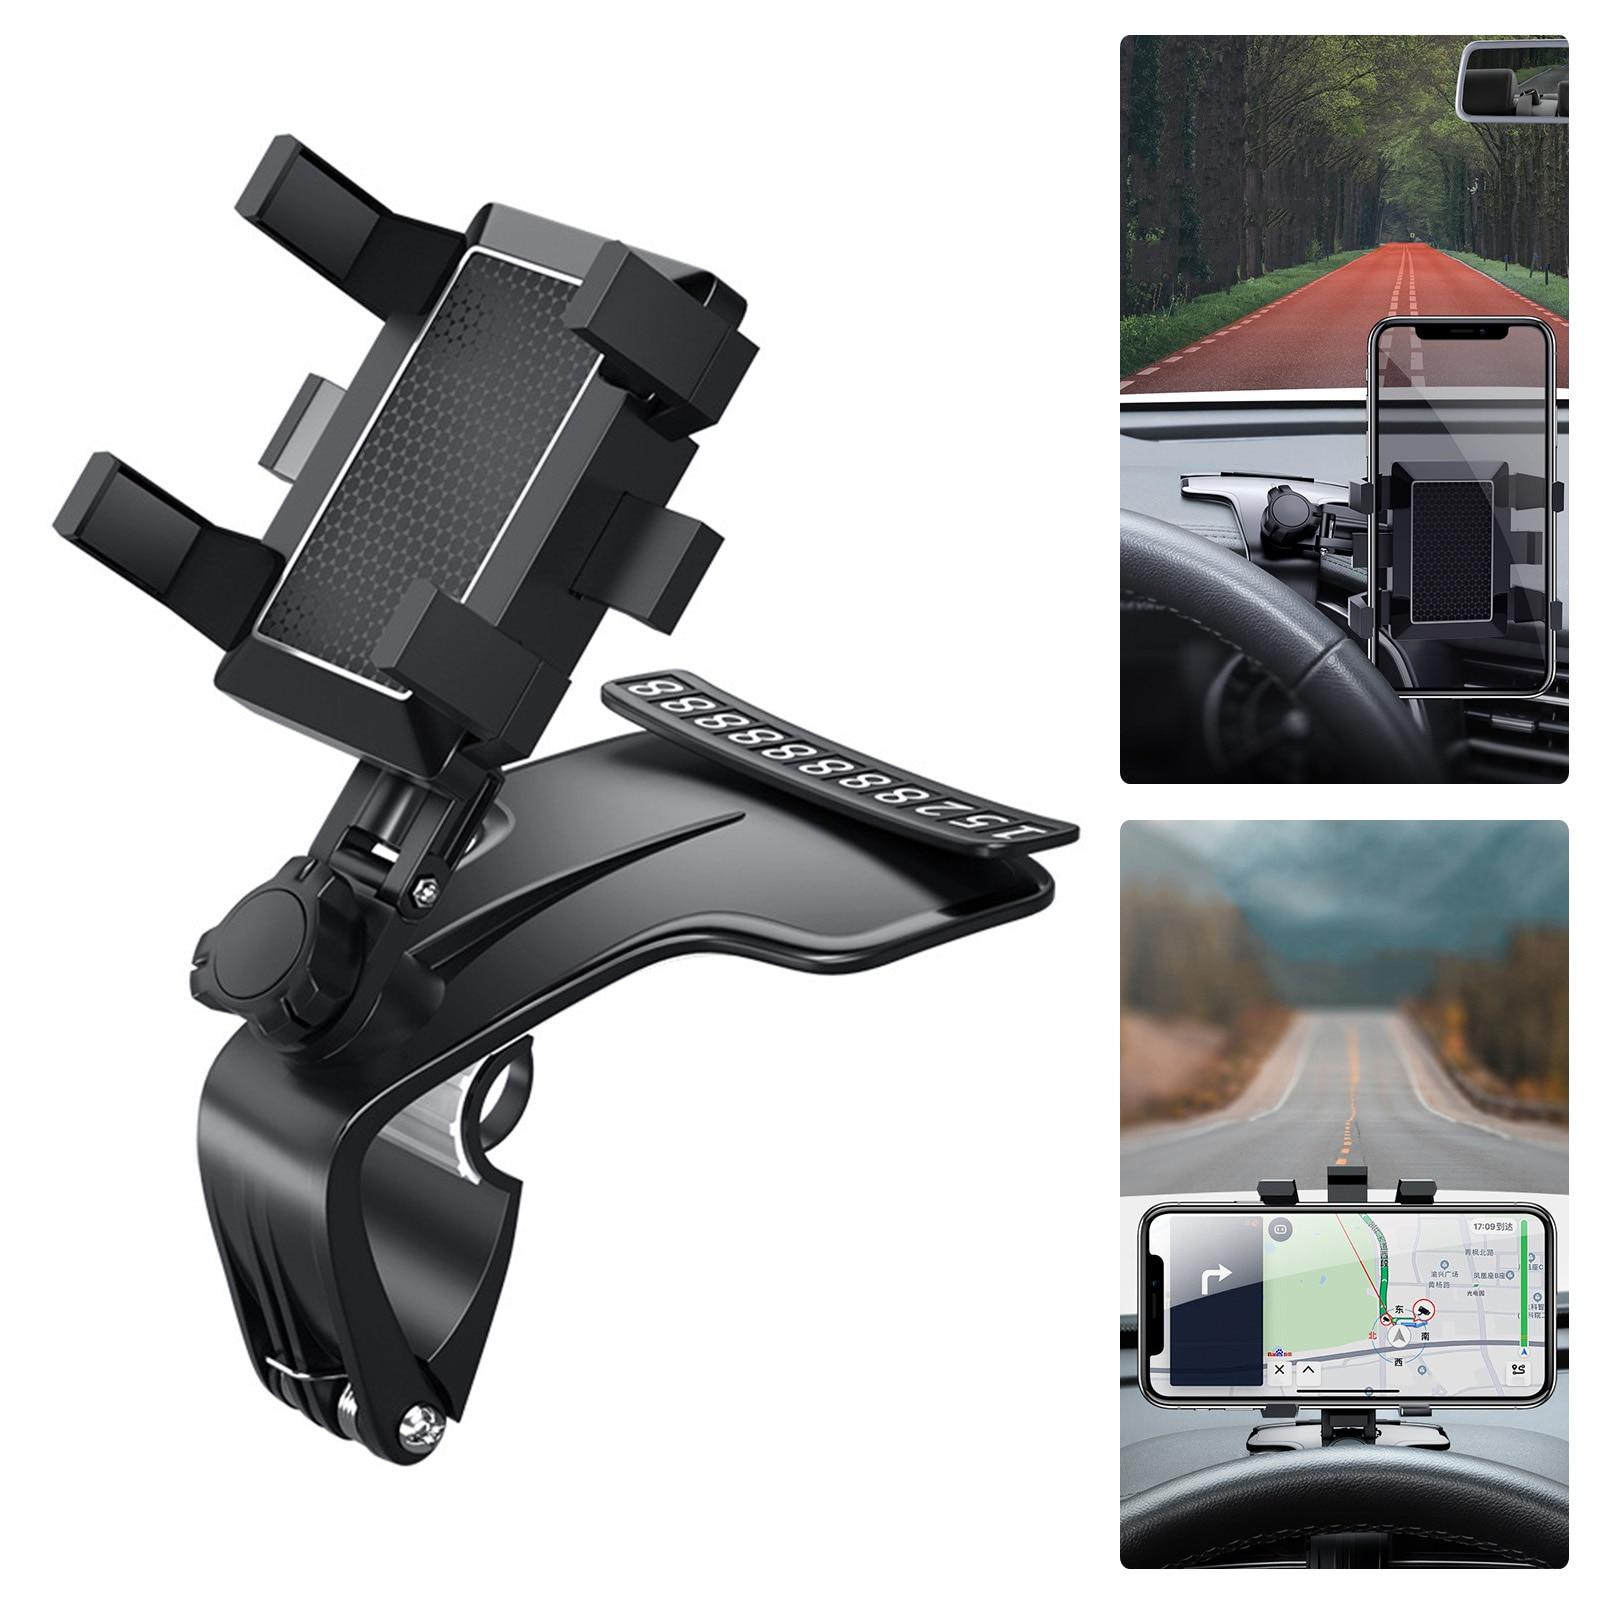 Car Mobile Phone Holder 360 Degree Rotating GPS Bracket Car Mount Mobile Holder For Car Accessories